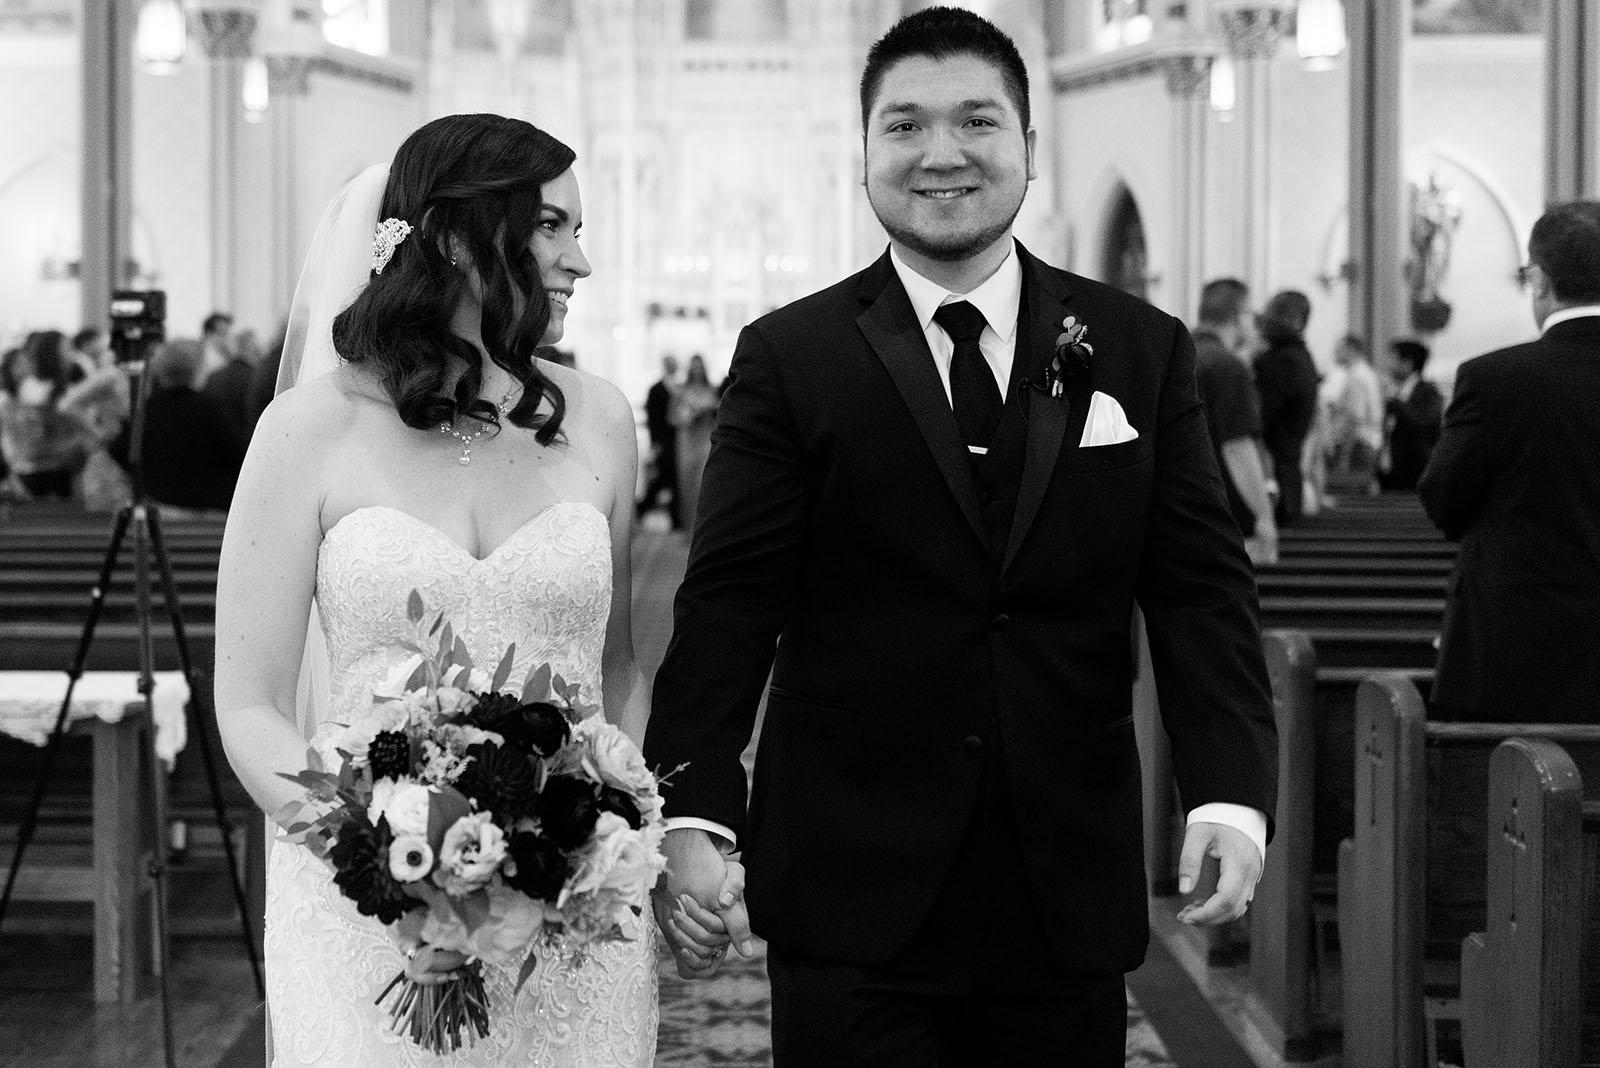 Bride Groom Coming Down Aisle Black White